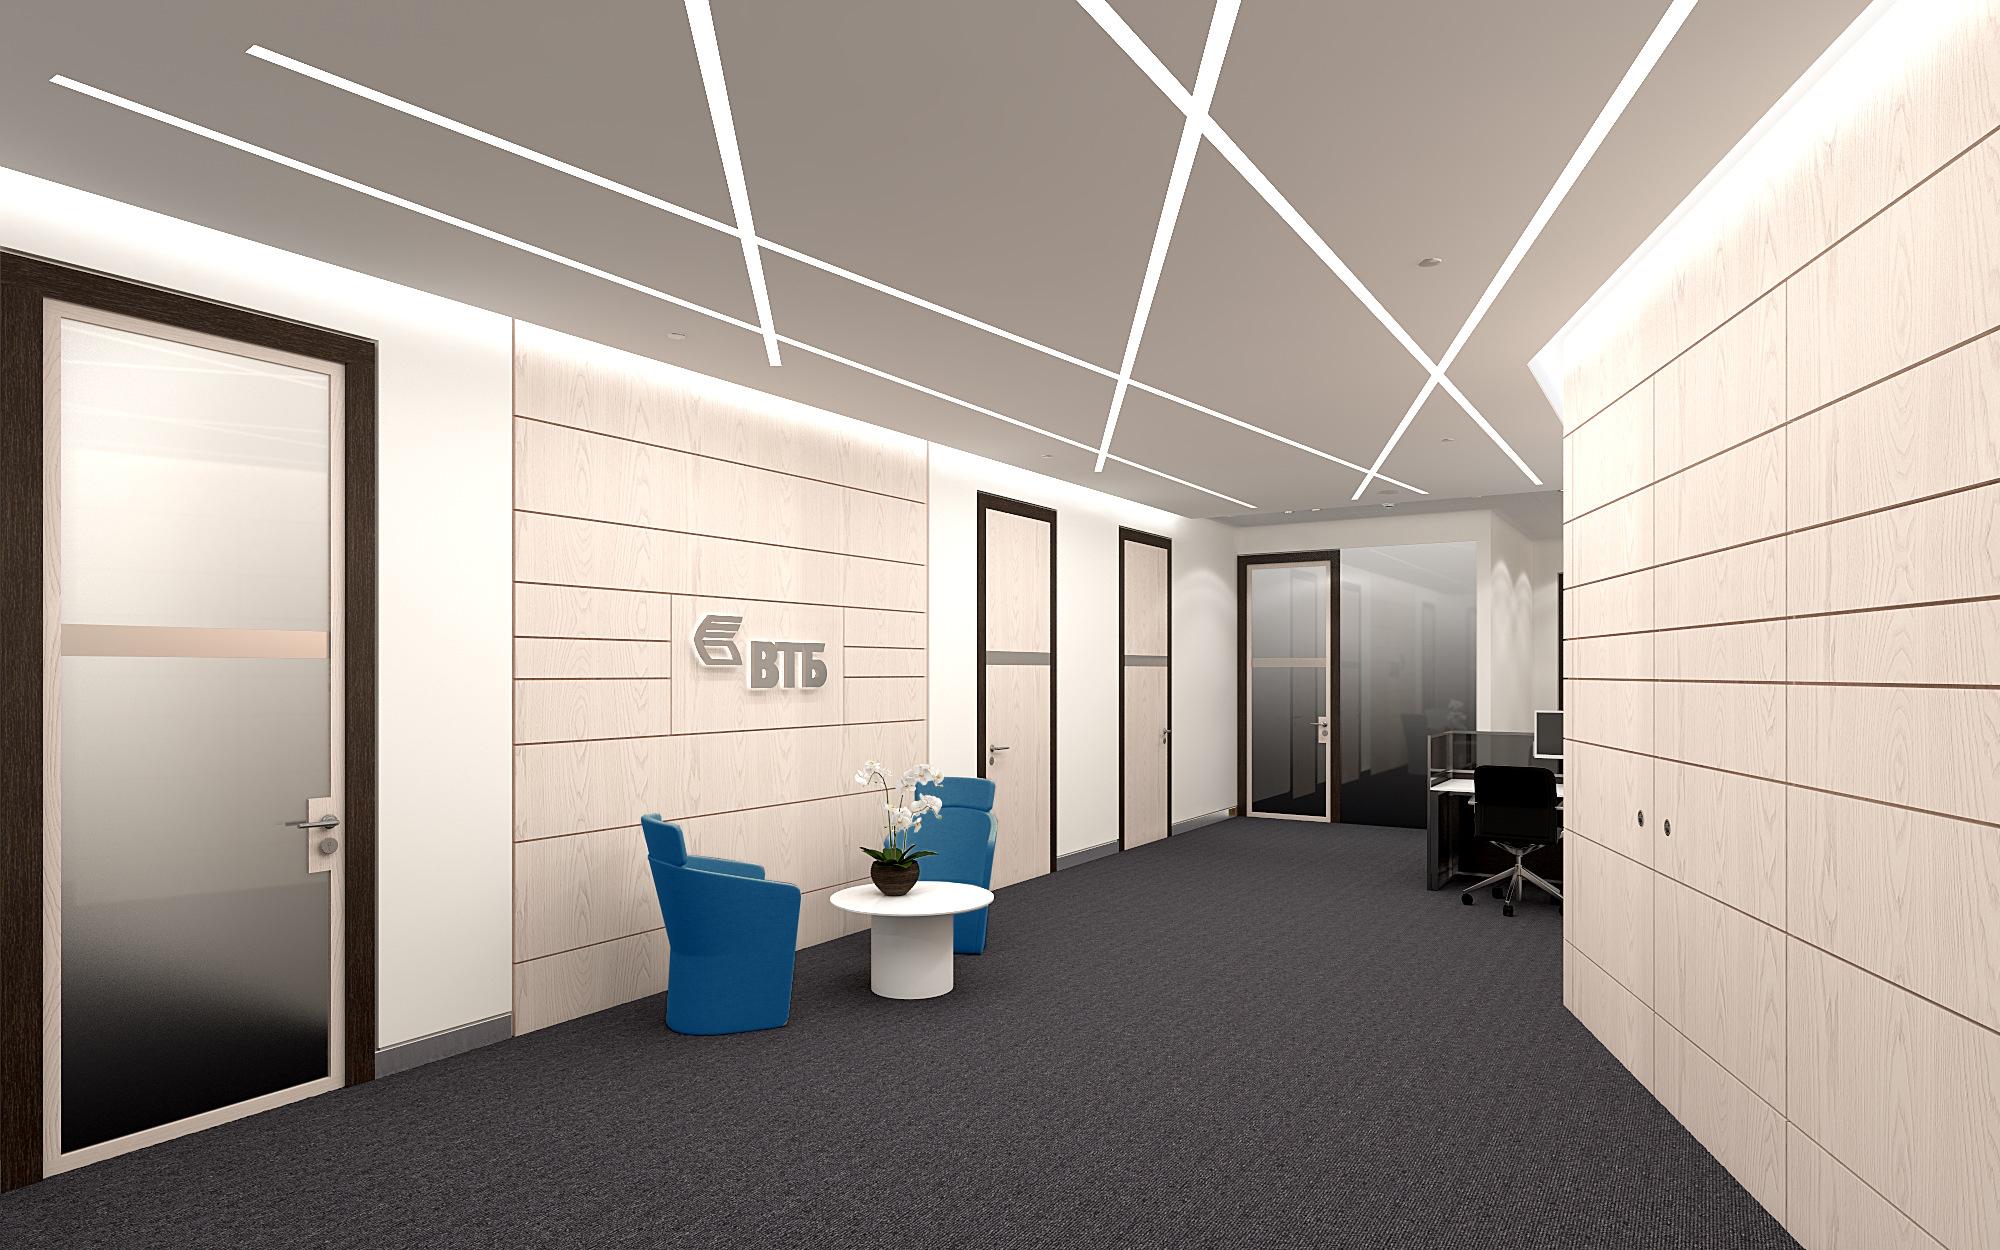 Офис ВТБ москва сити башня федерация